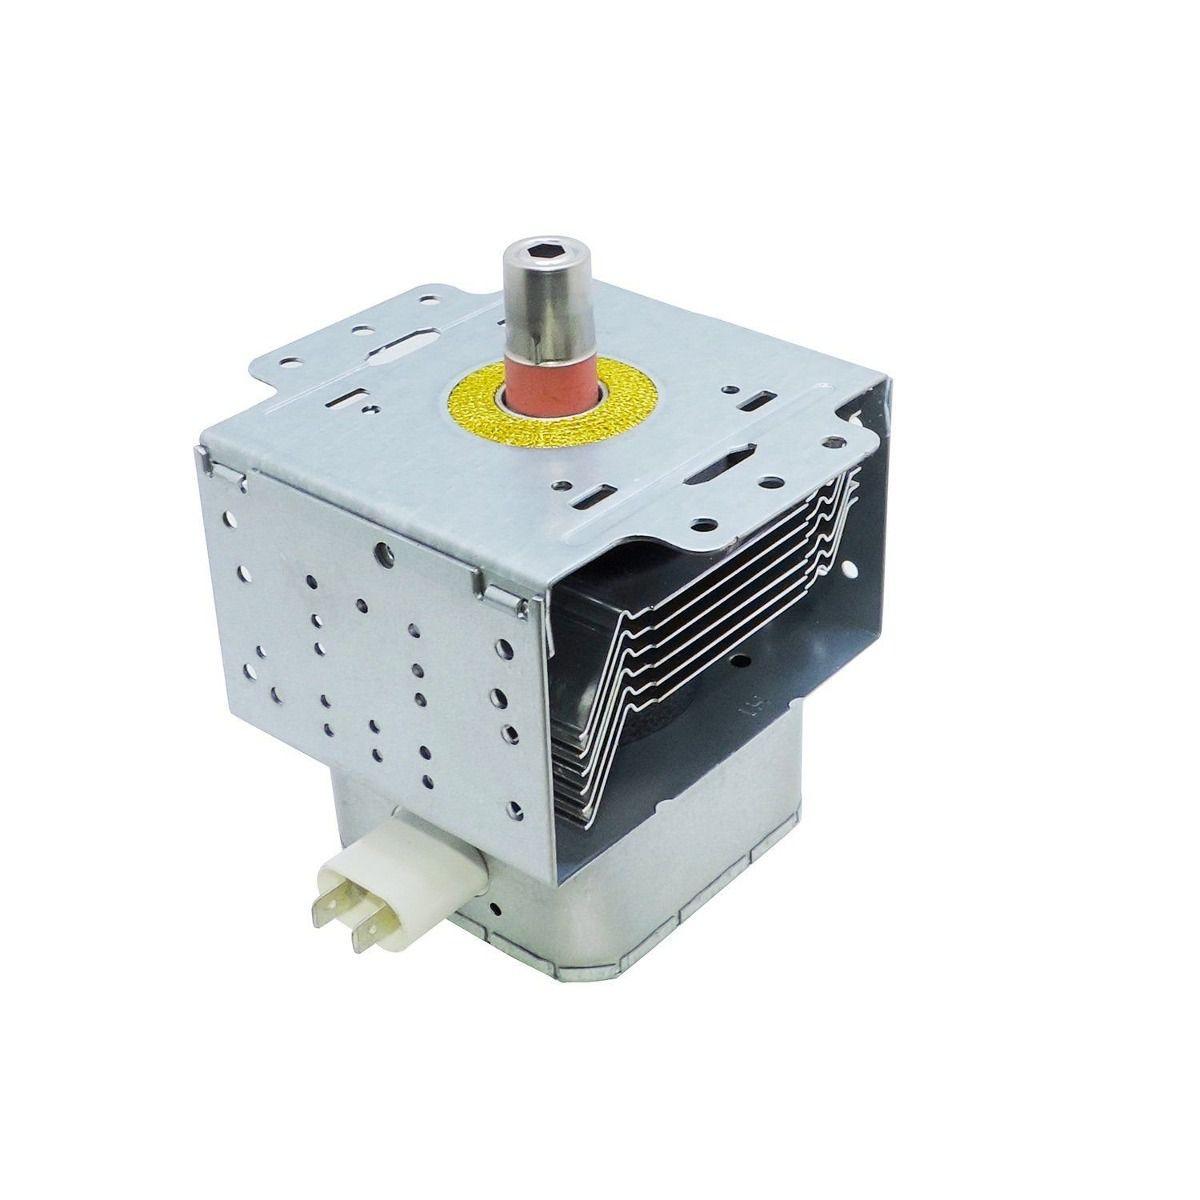 Magnetron Para Microondas Mef41 Meg41 Electrolux - 64502171